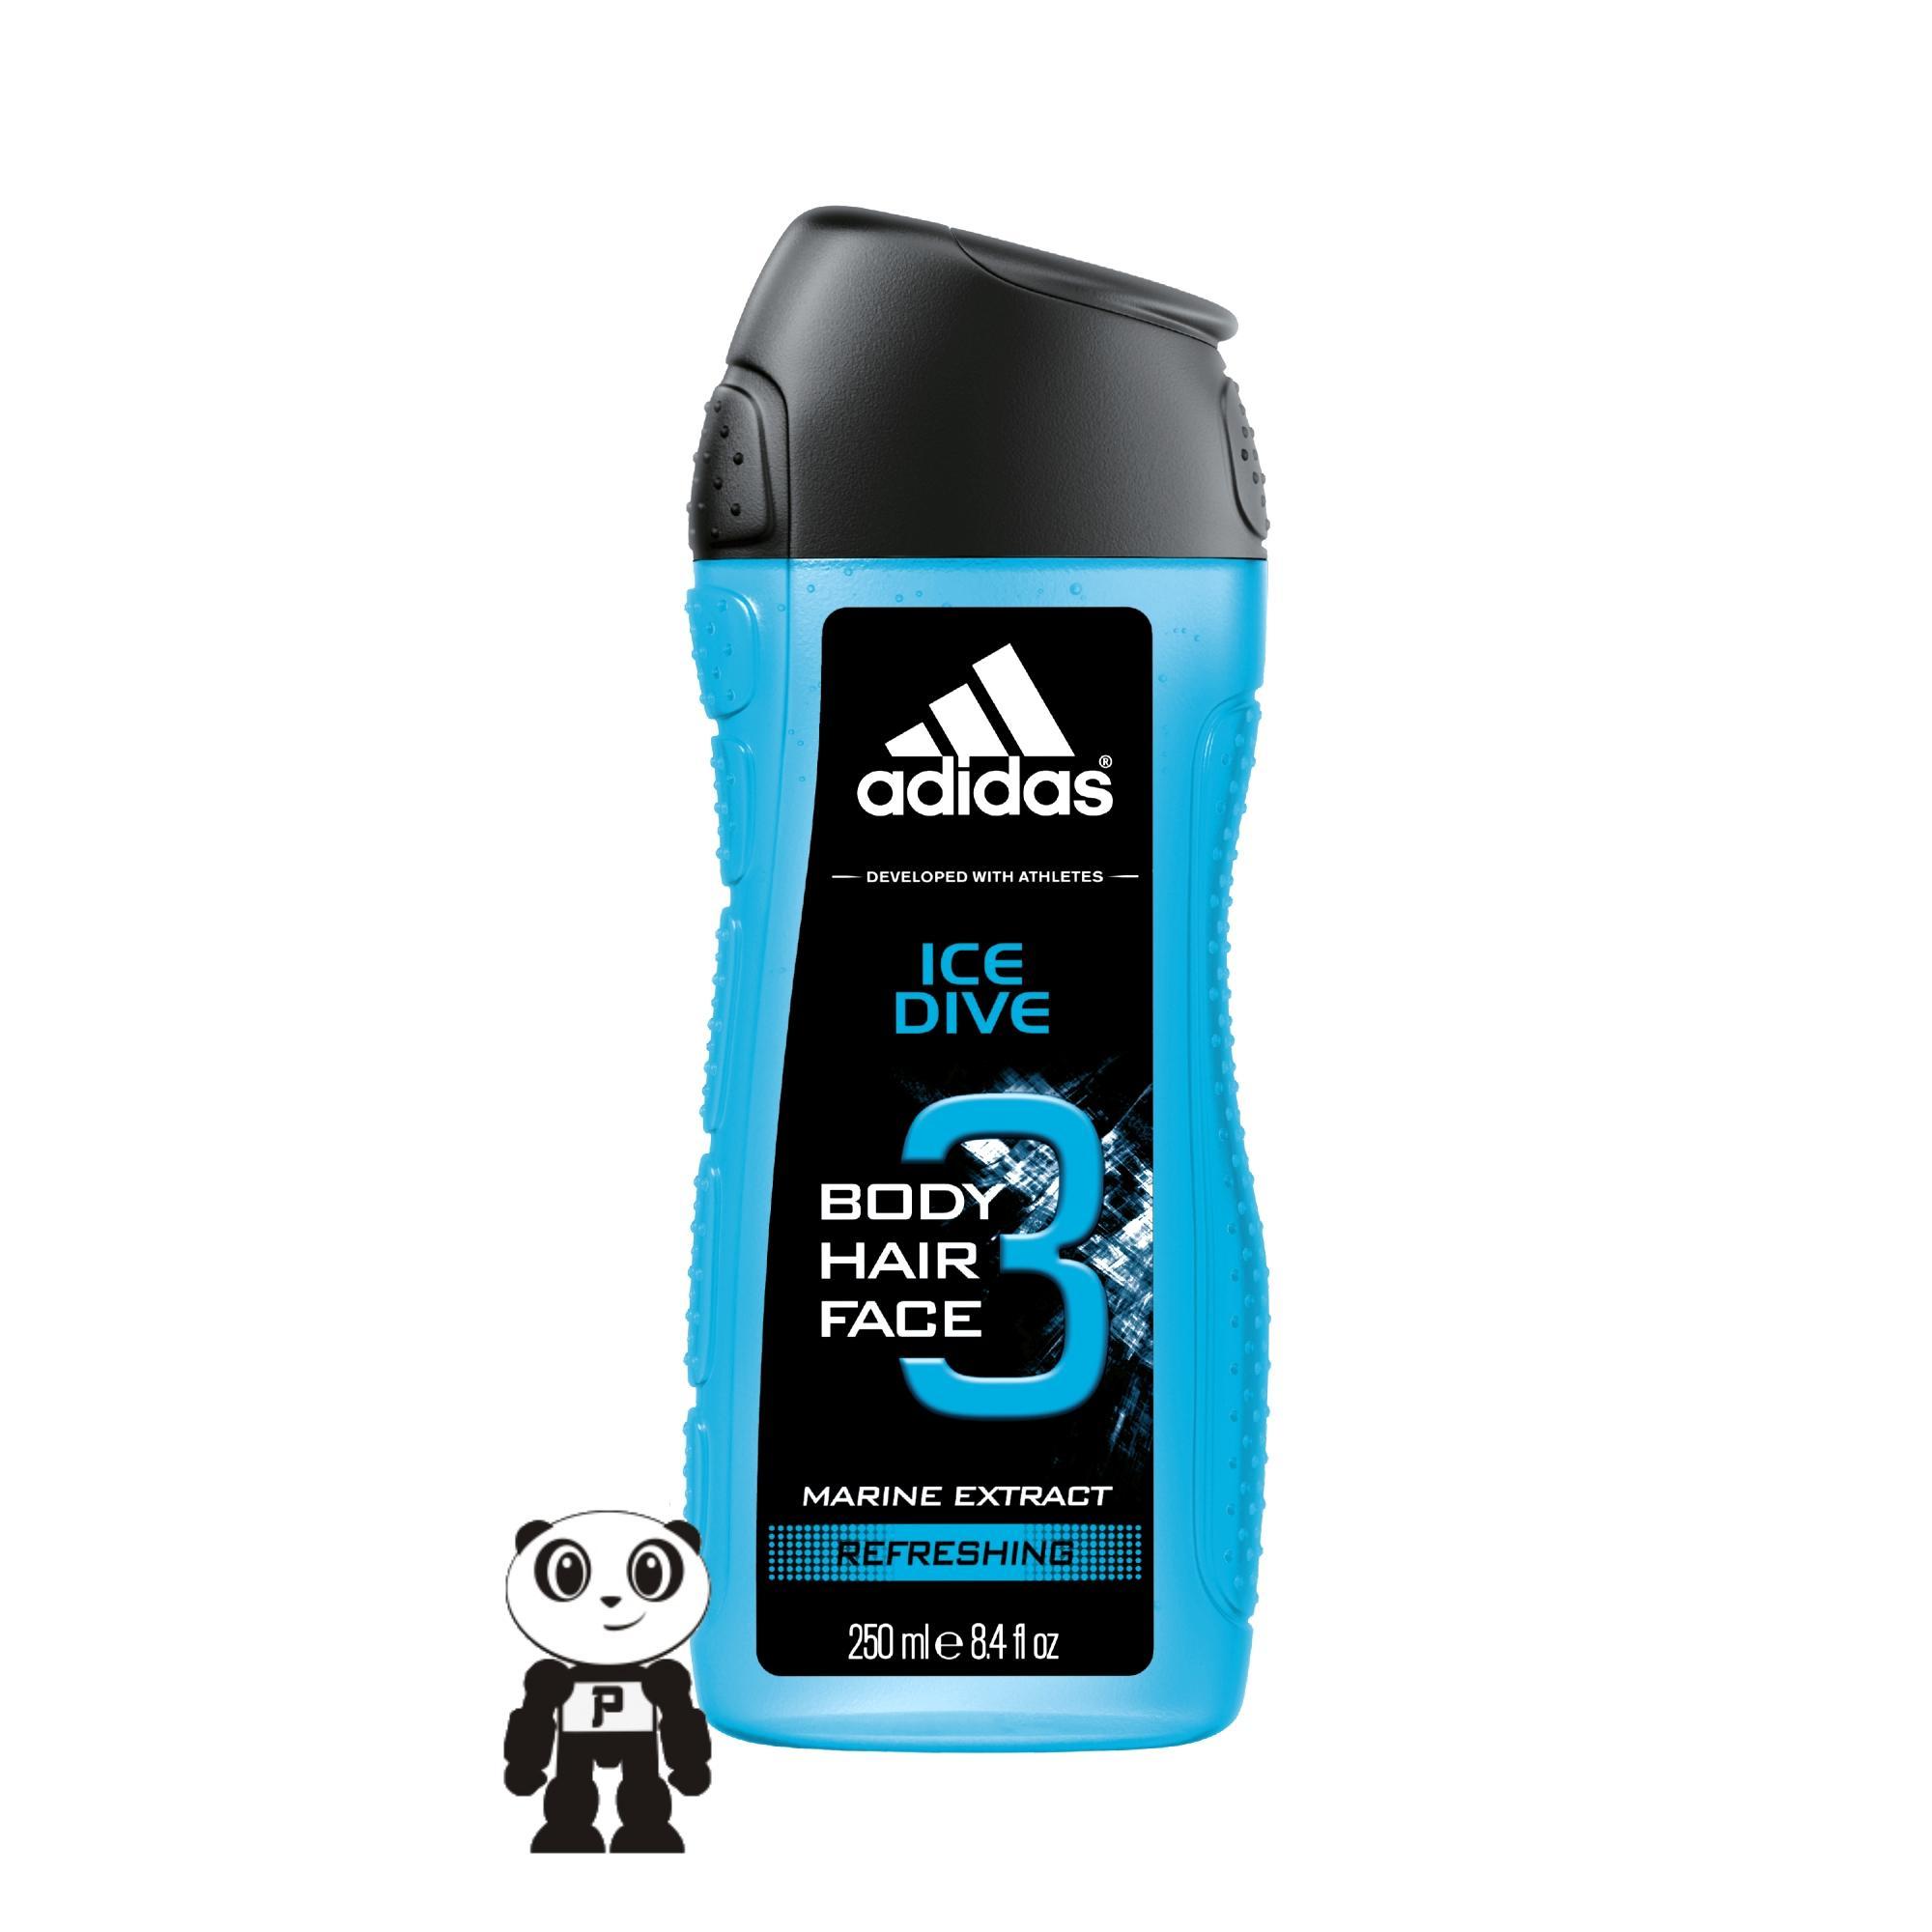 Adidas Body Hair Face Sabun Mandi Pria 250ml By Panda Elektronik.